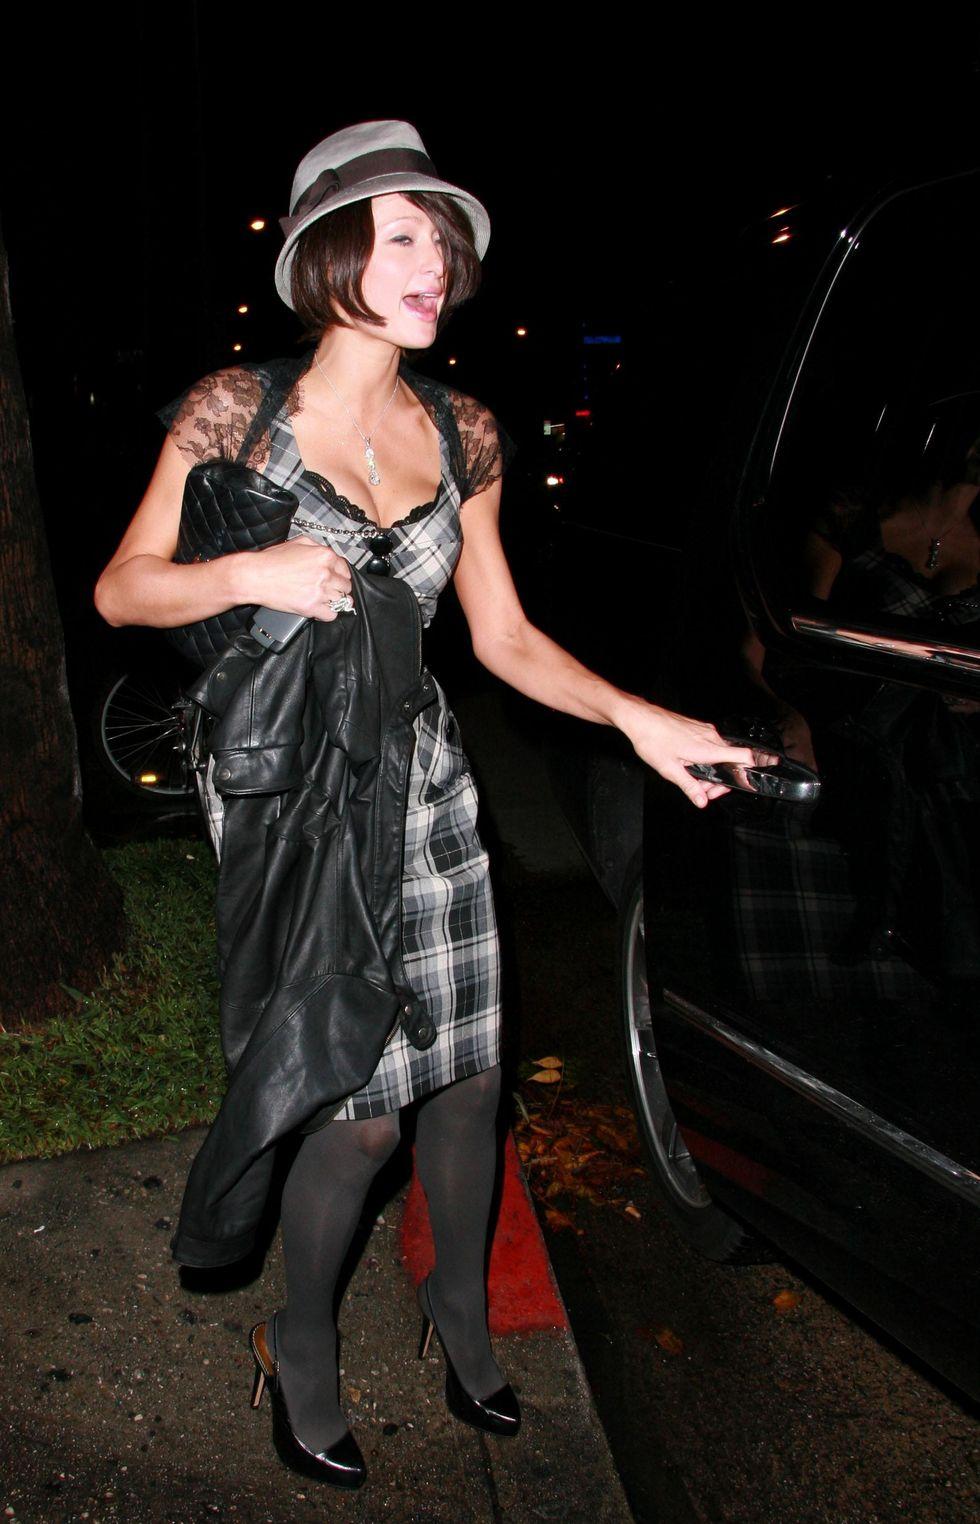 paris-hilton-cleavagy-candids-at-falcon-club-in-hollywood-07